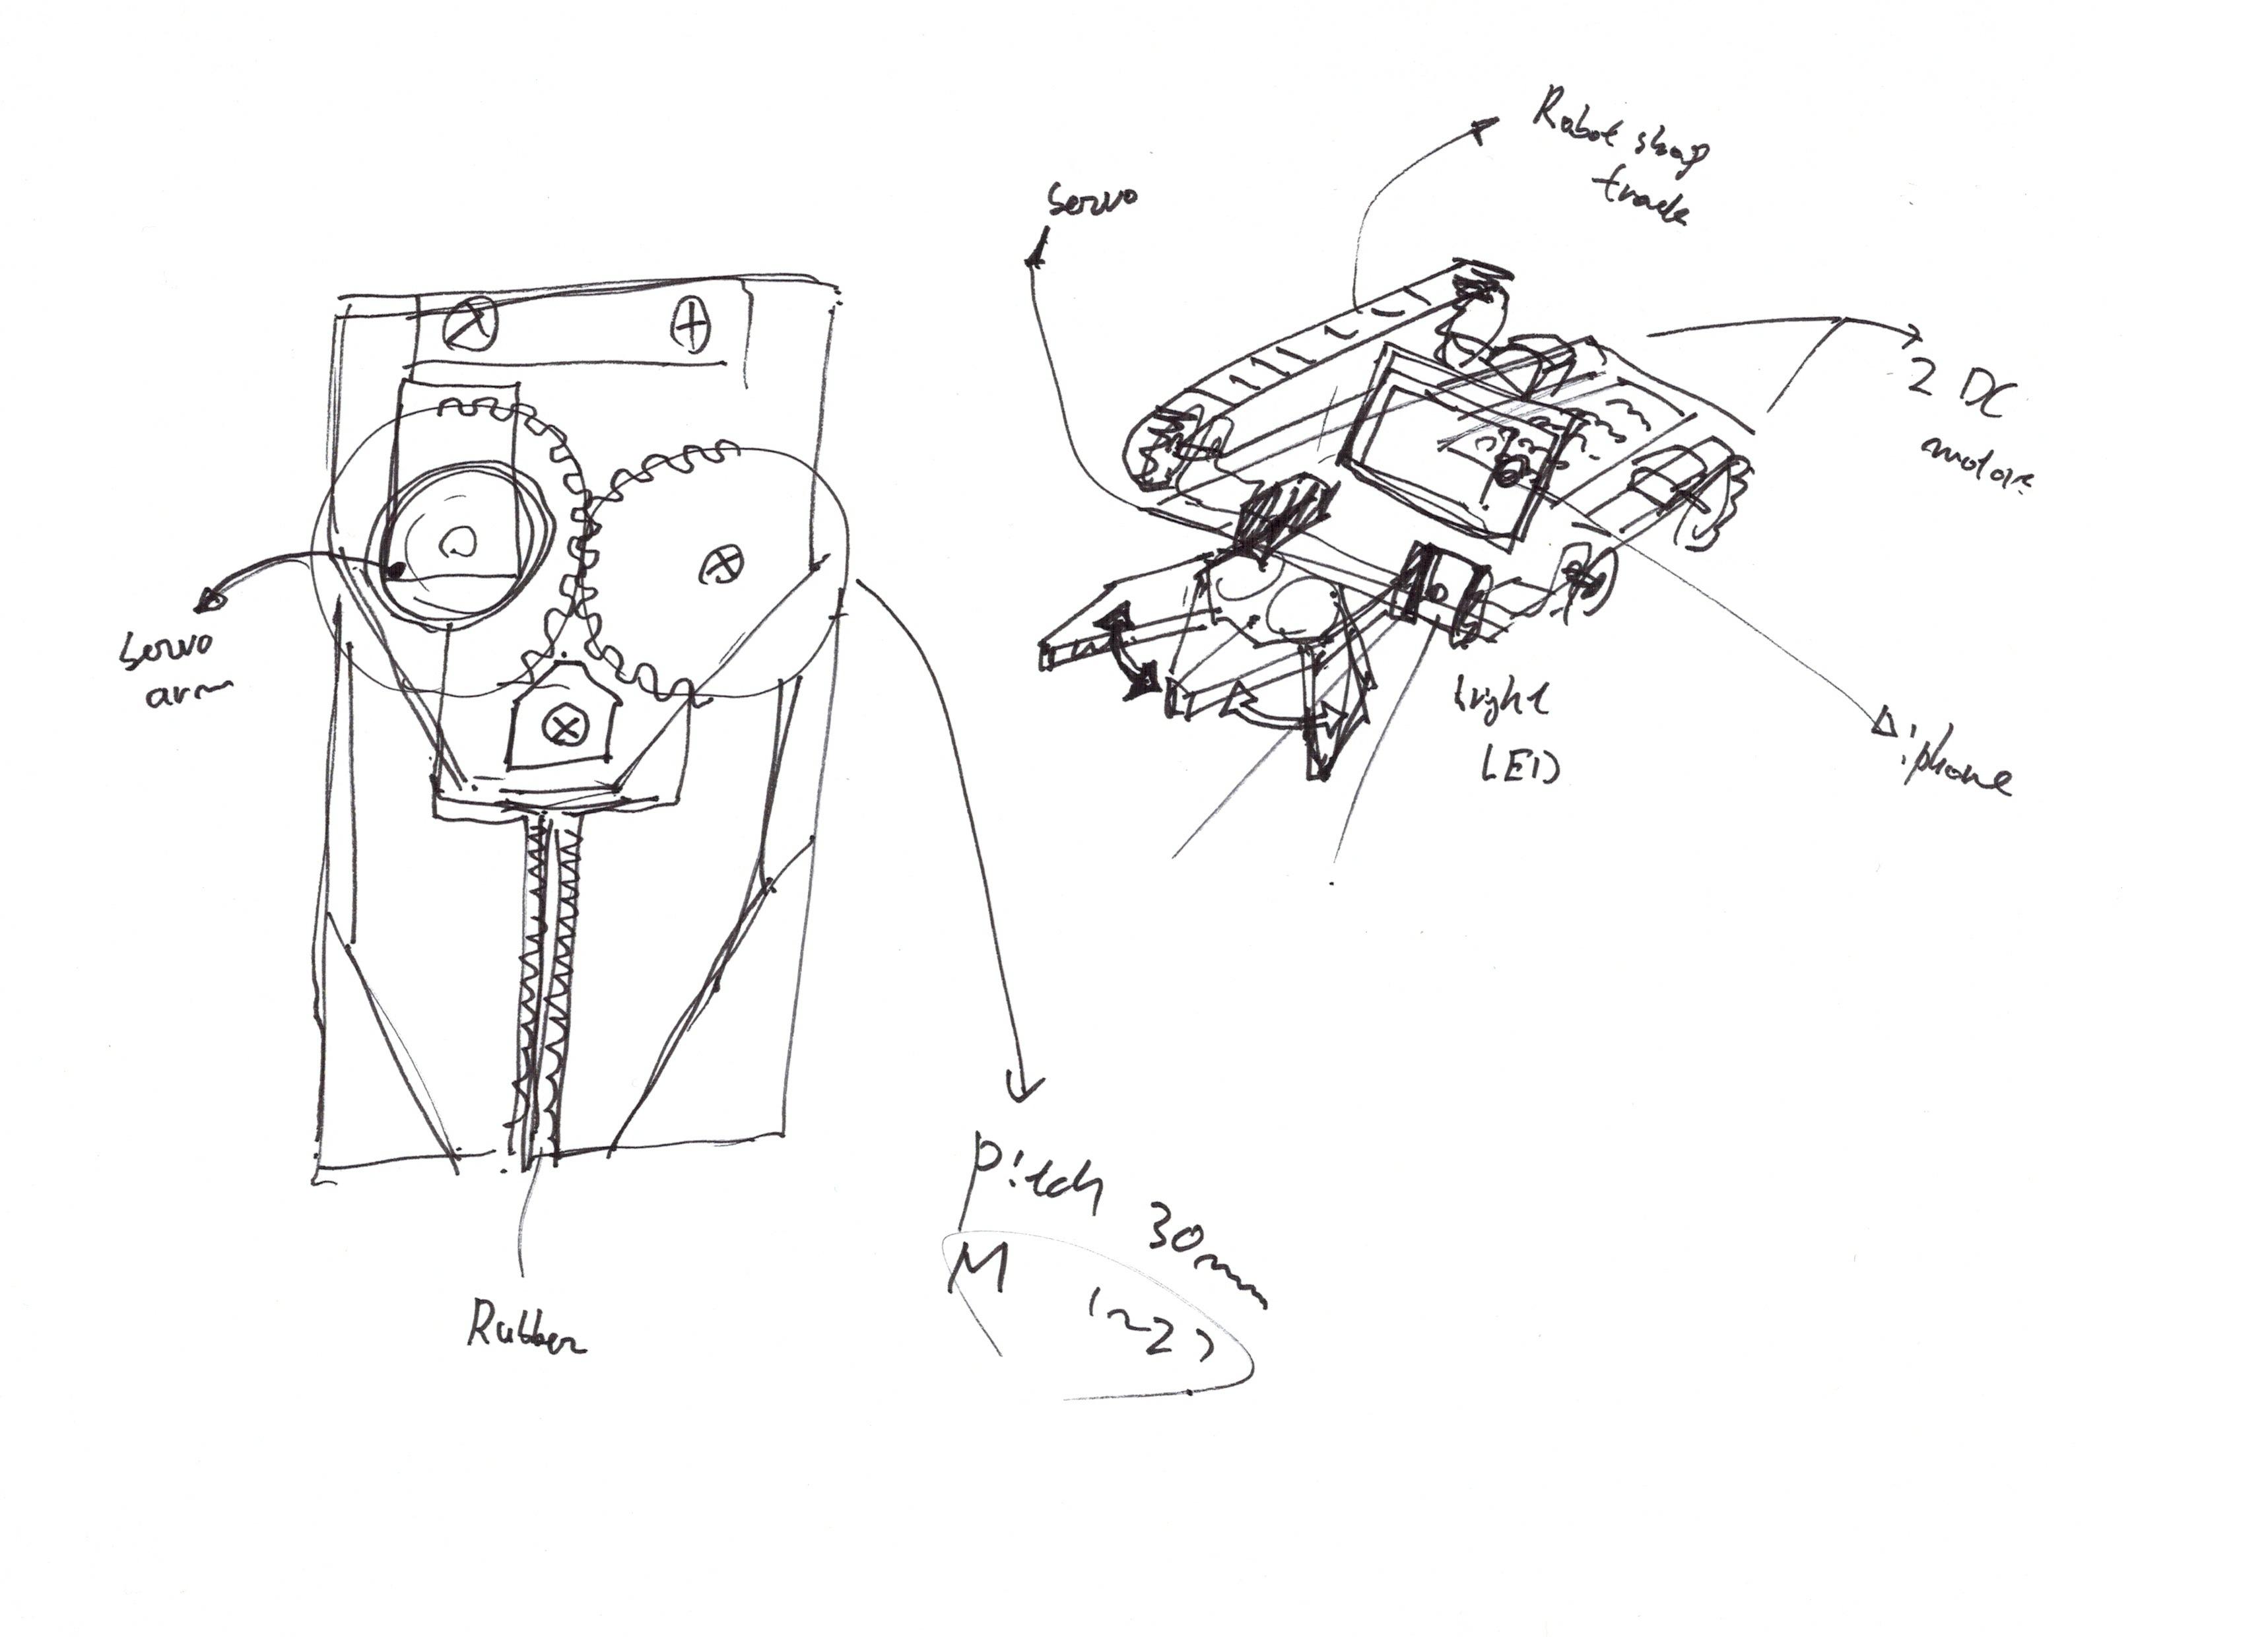 Remote Control Facetime Car: a littleBits Project by